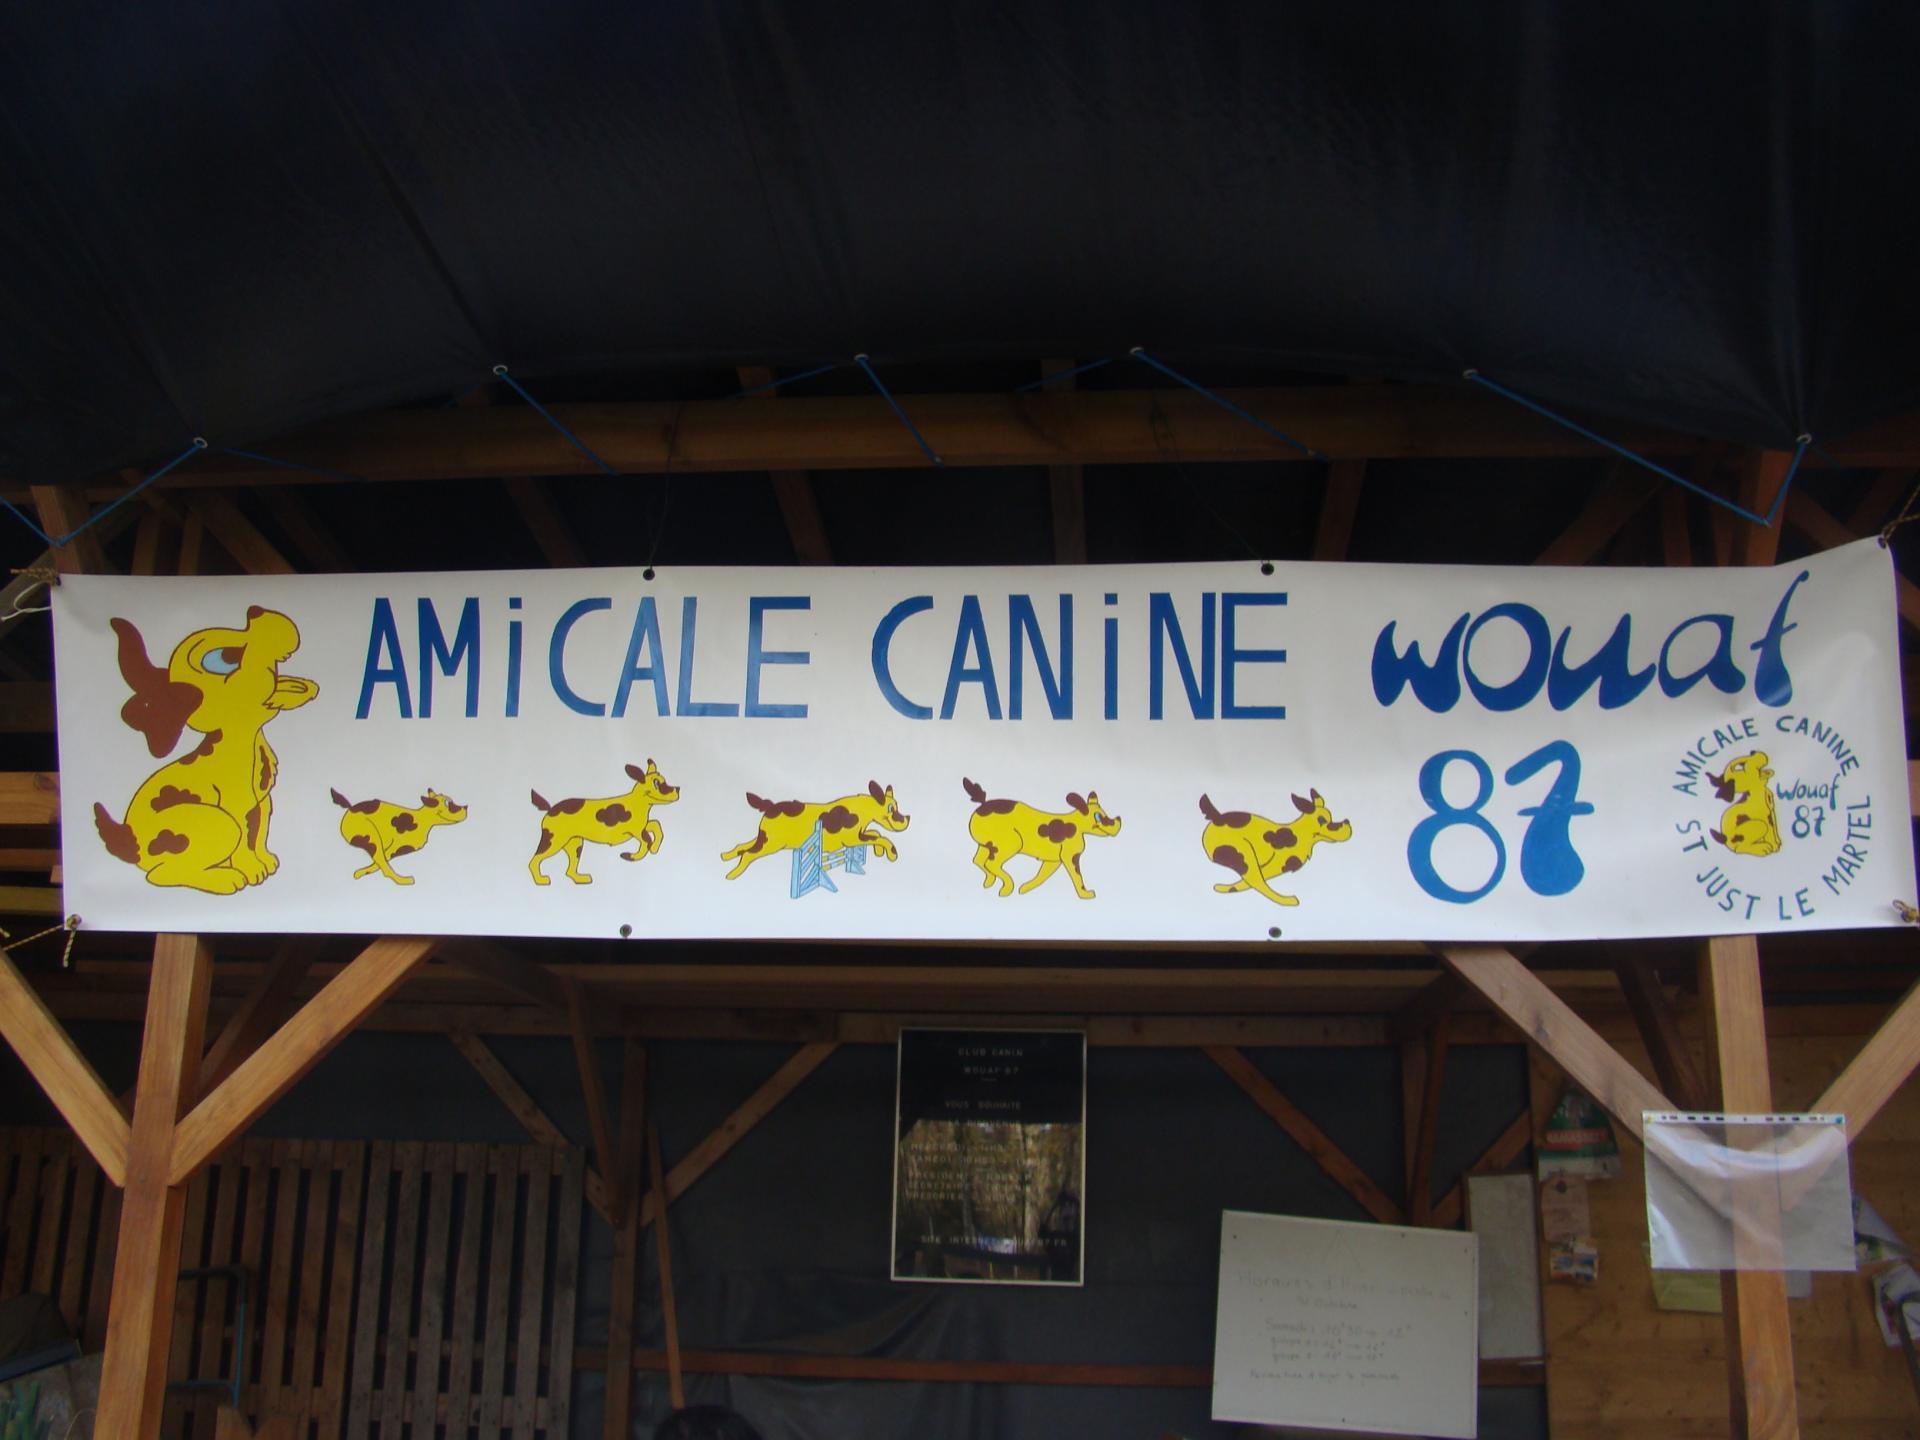 Amicale Canine wouaf 87